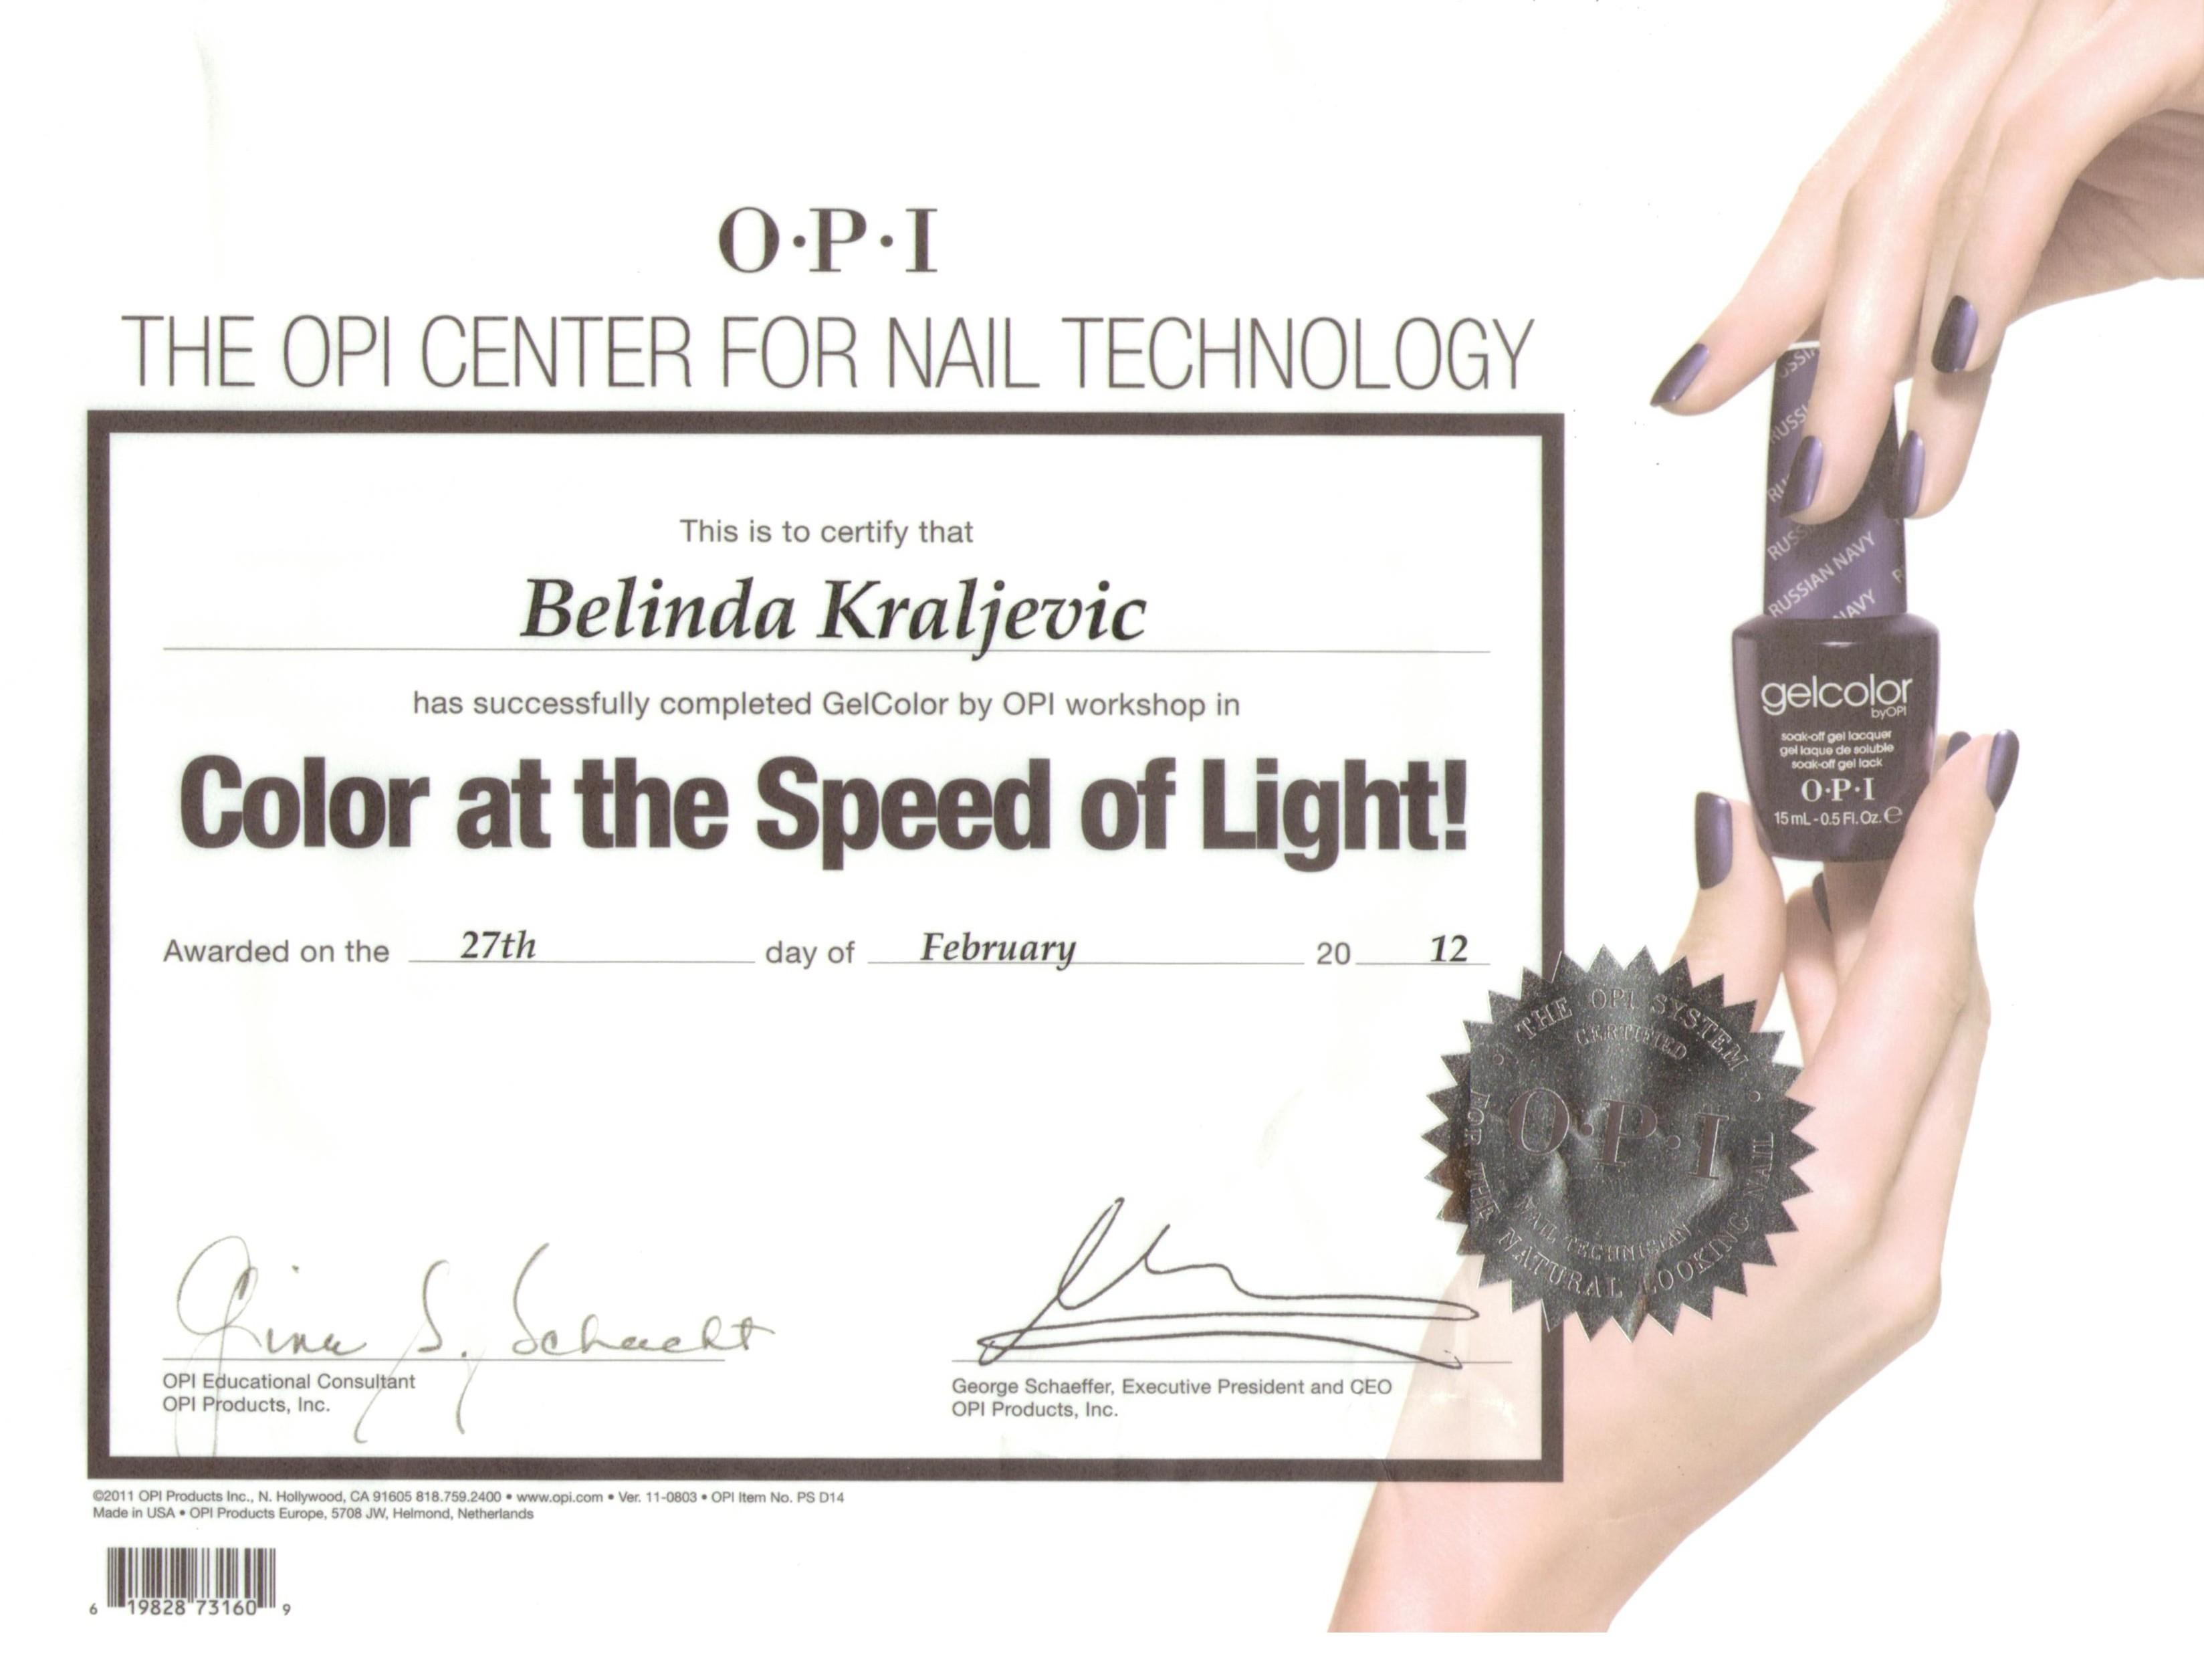 OPI Certification